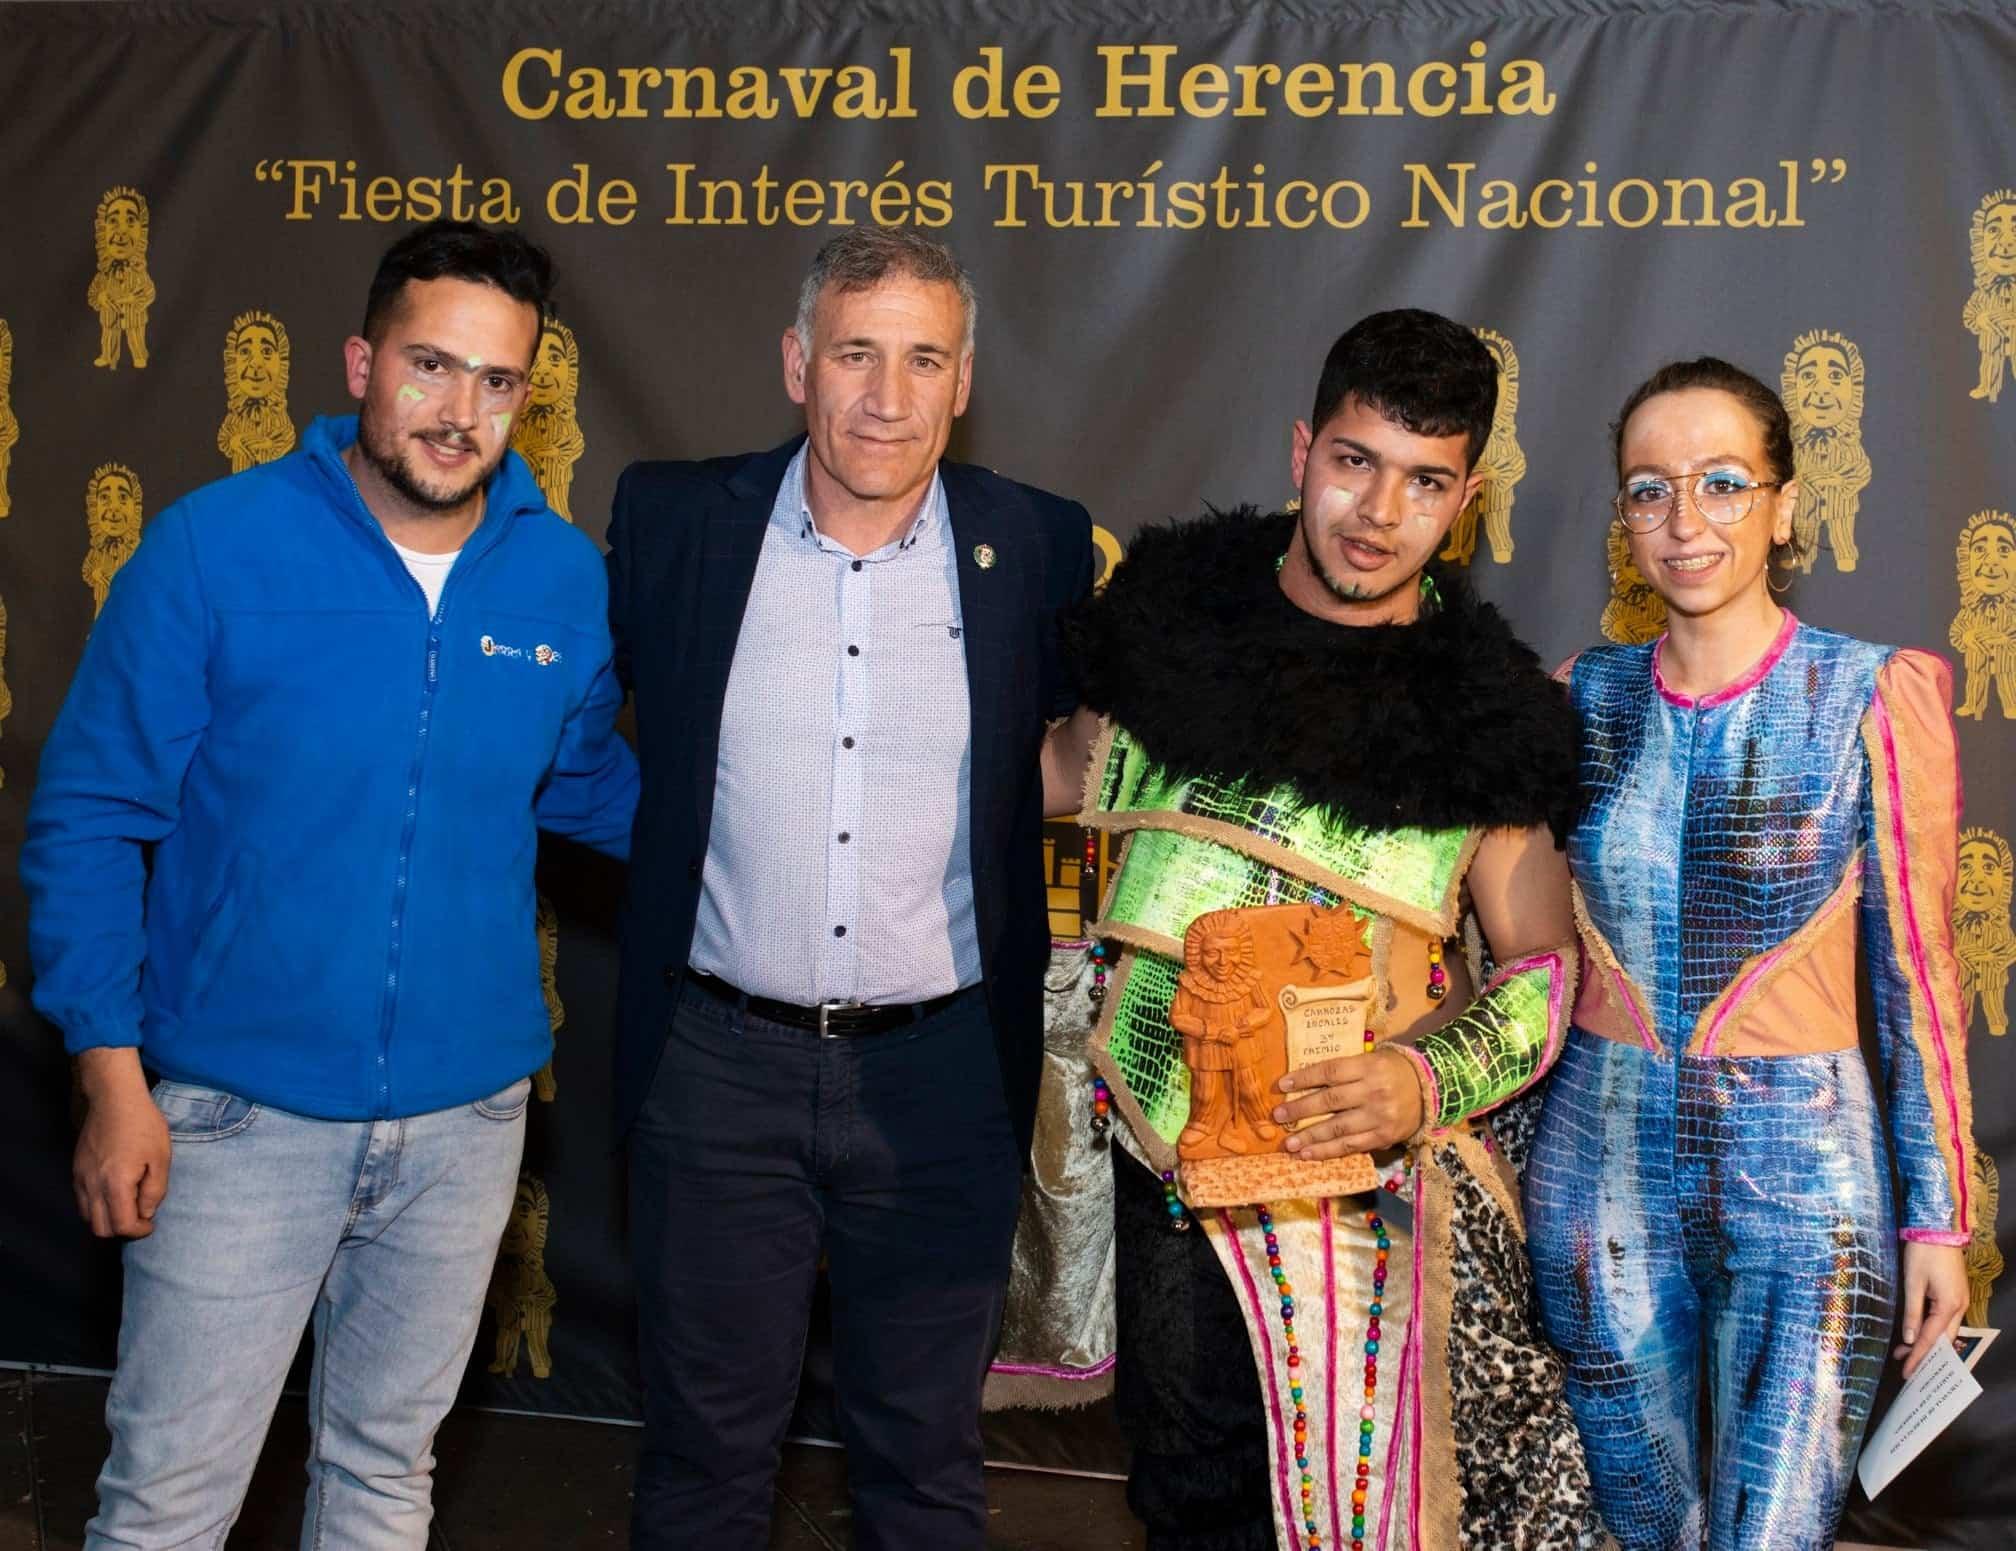 Carnaval de herencia 2020 ofertorio 172 - Selección de fotografías del Ofertorio del Carnaval de Herencia